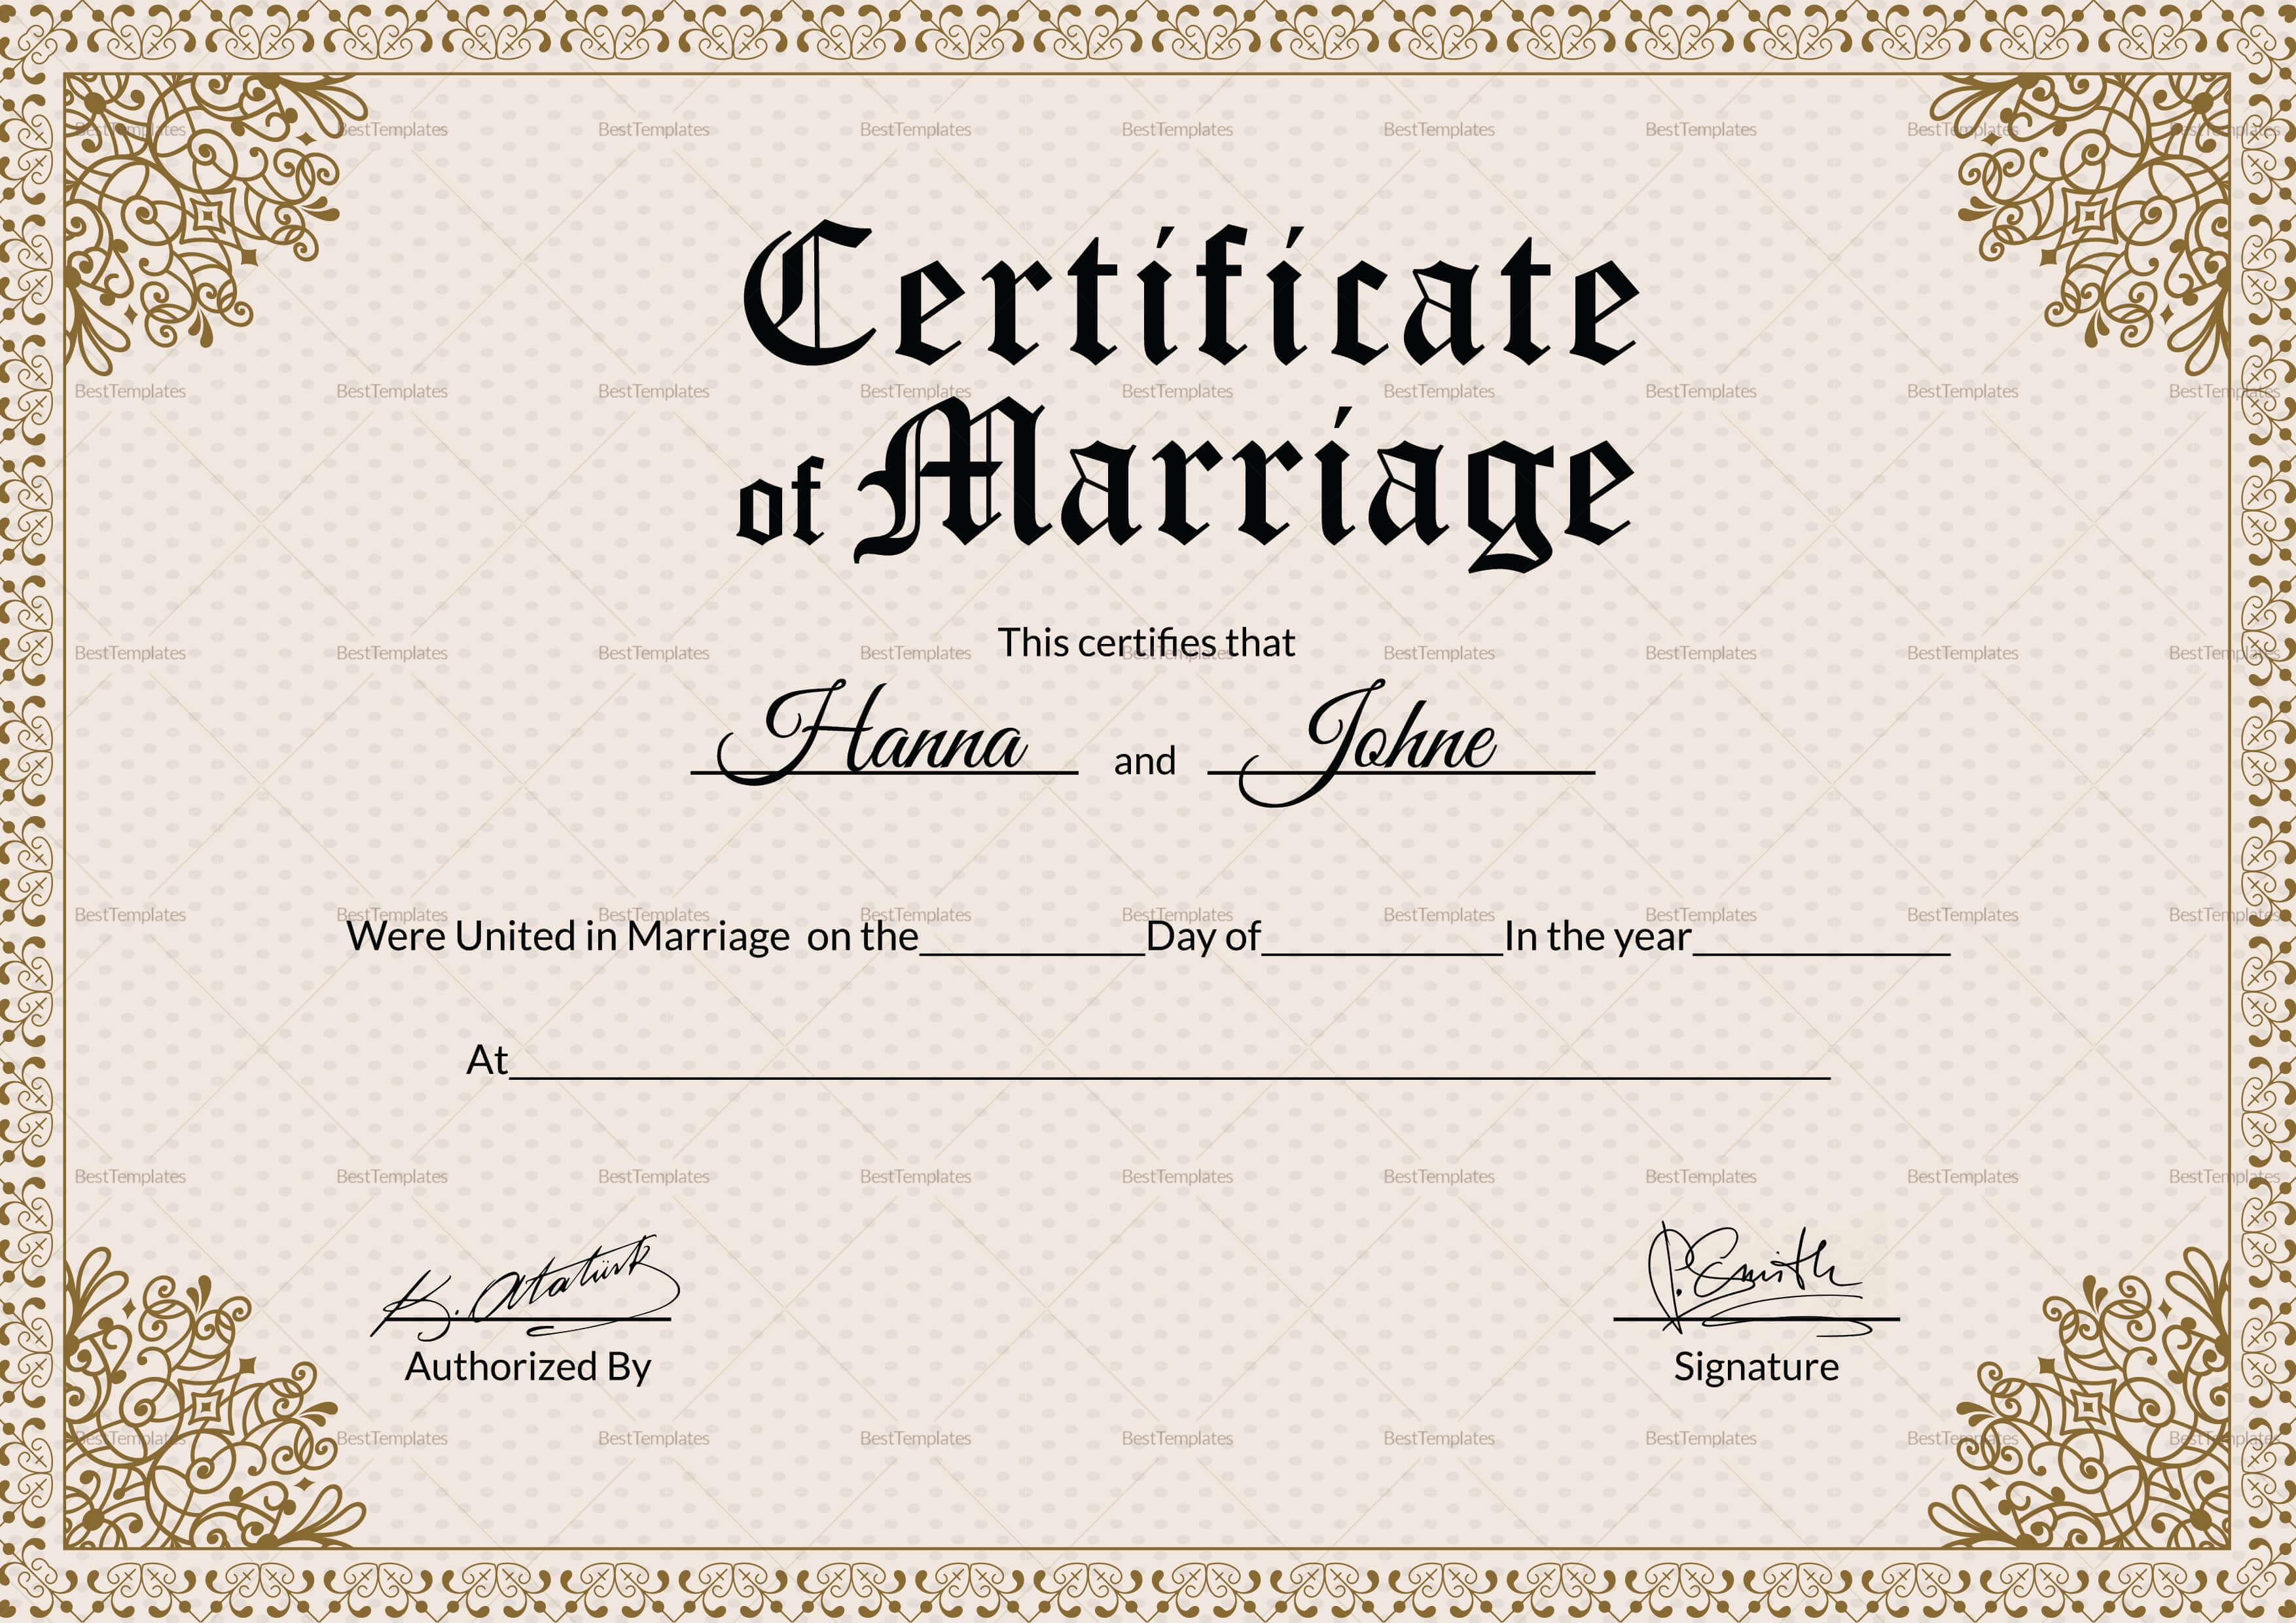 001 Keepsake Marriage Certificate28129 Template Ideas pertaining to Certificate Of Marriage Template